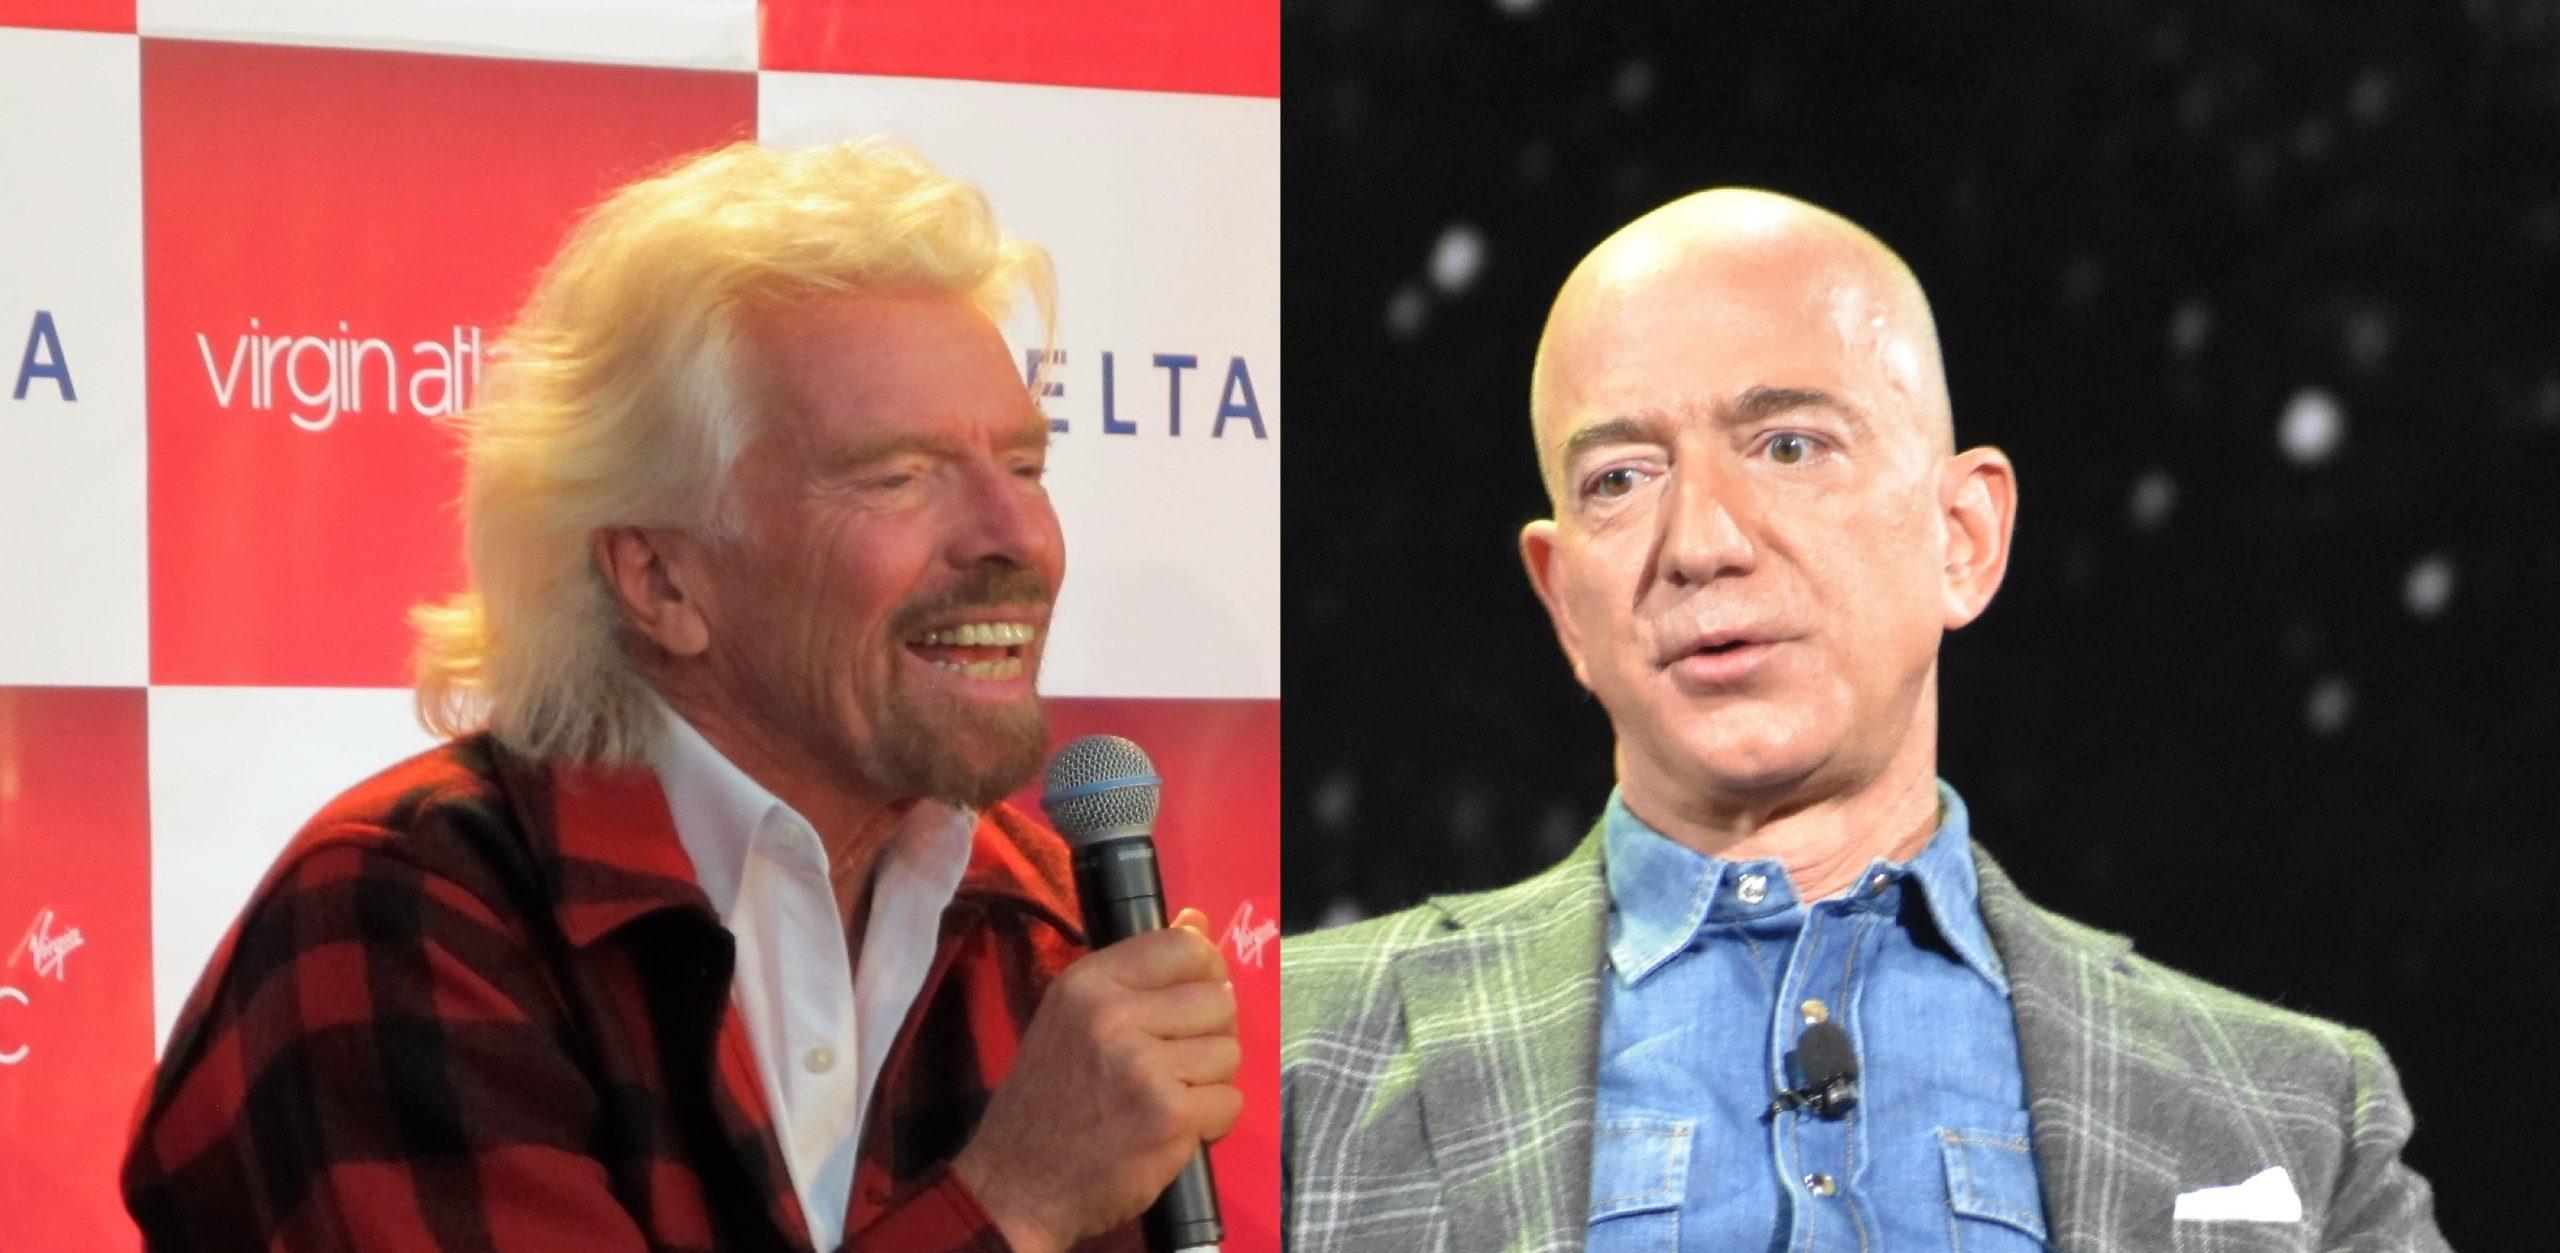 Virgin Galactic downplays talk about Branson vs. Bezos space race